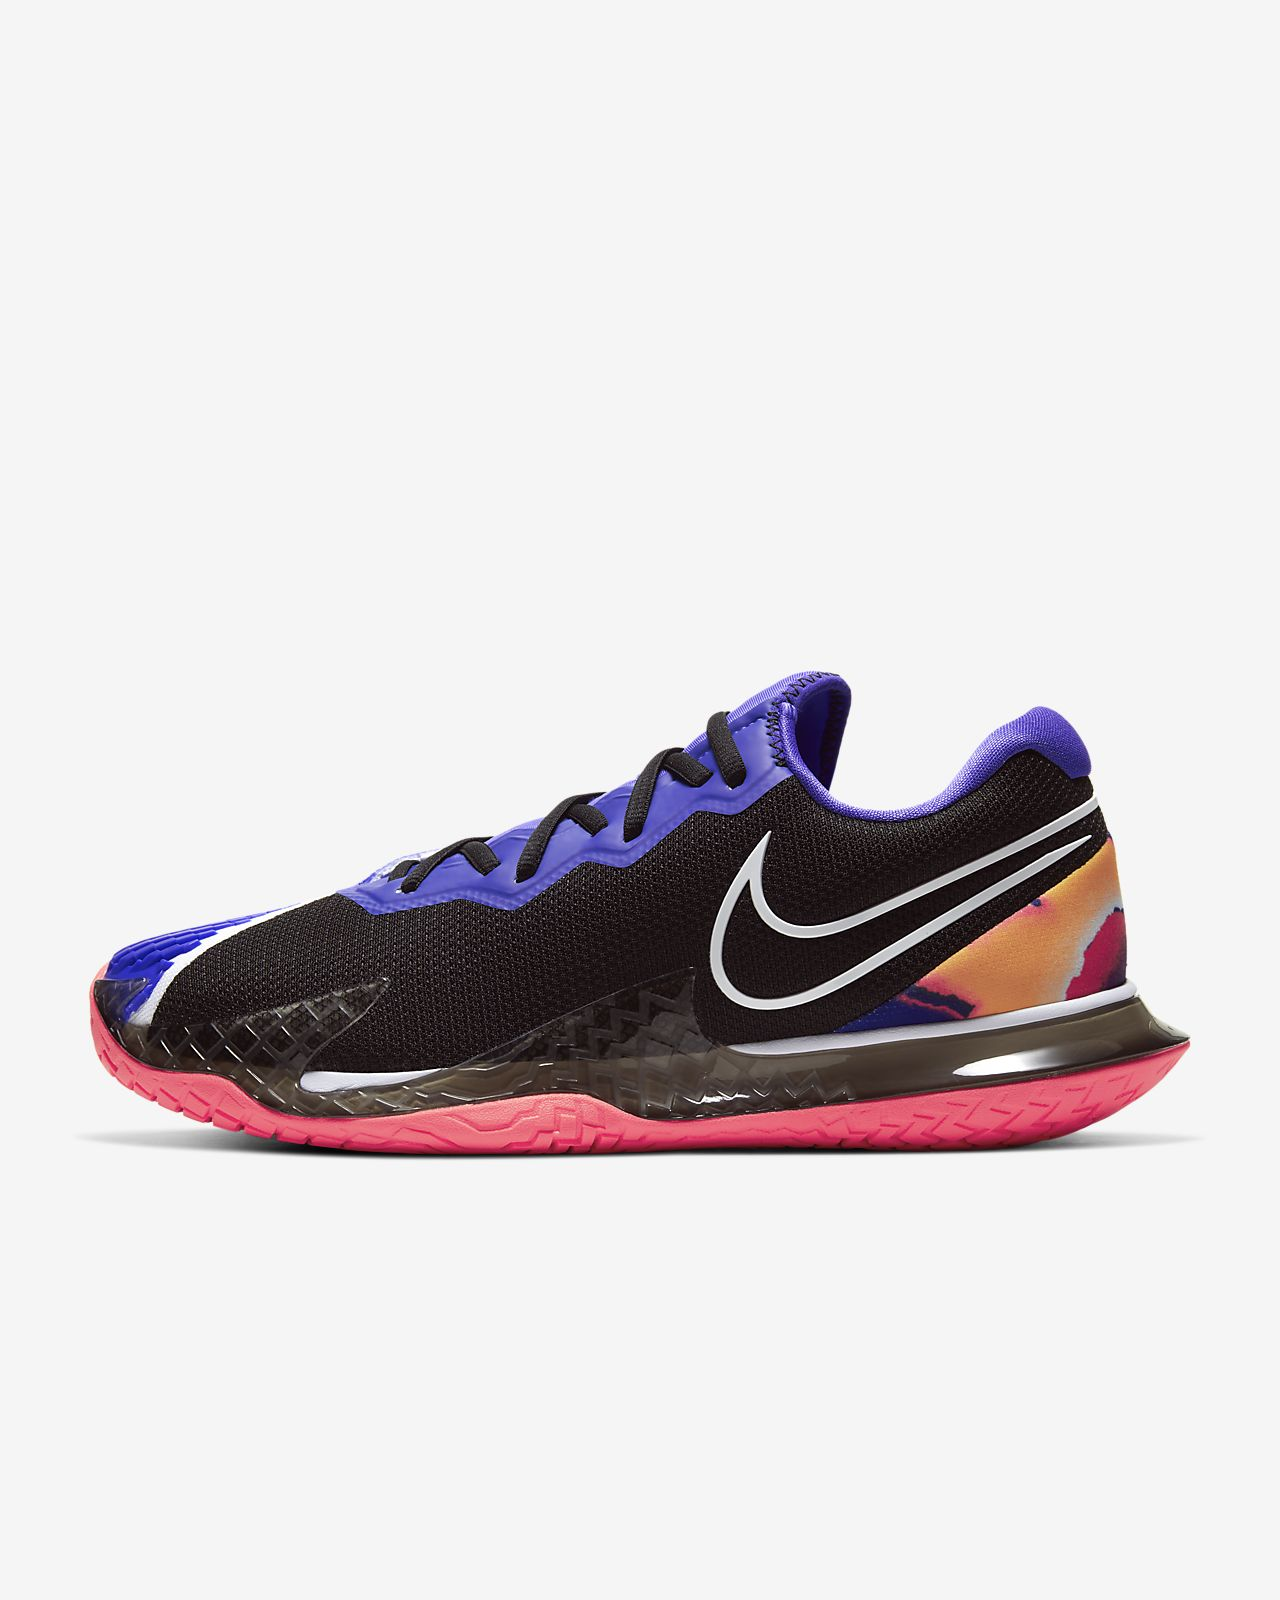 scarpe da tennis uomo nike 2019